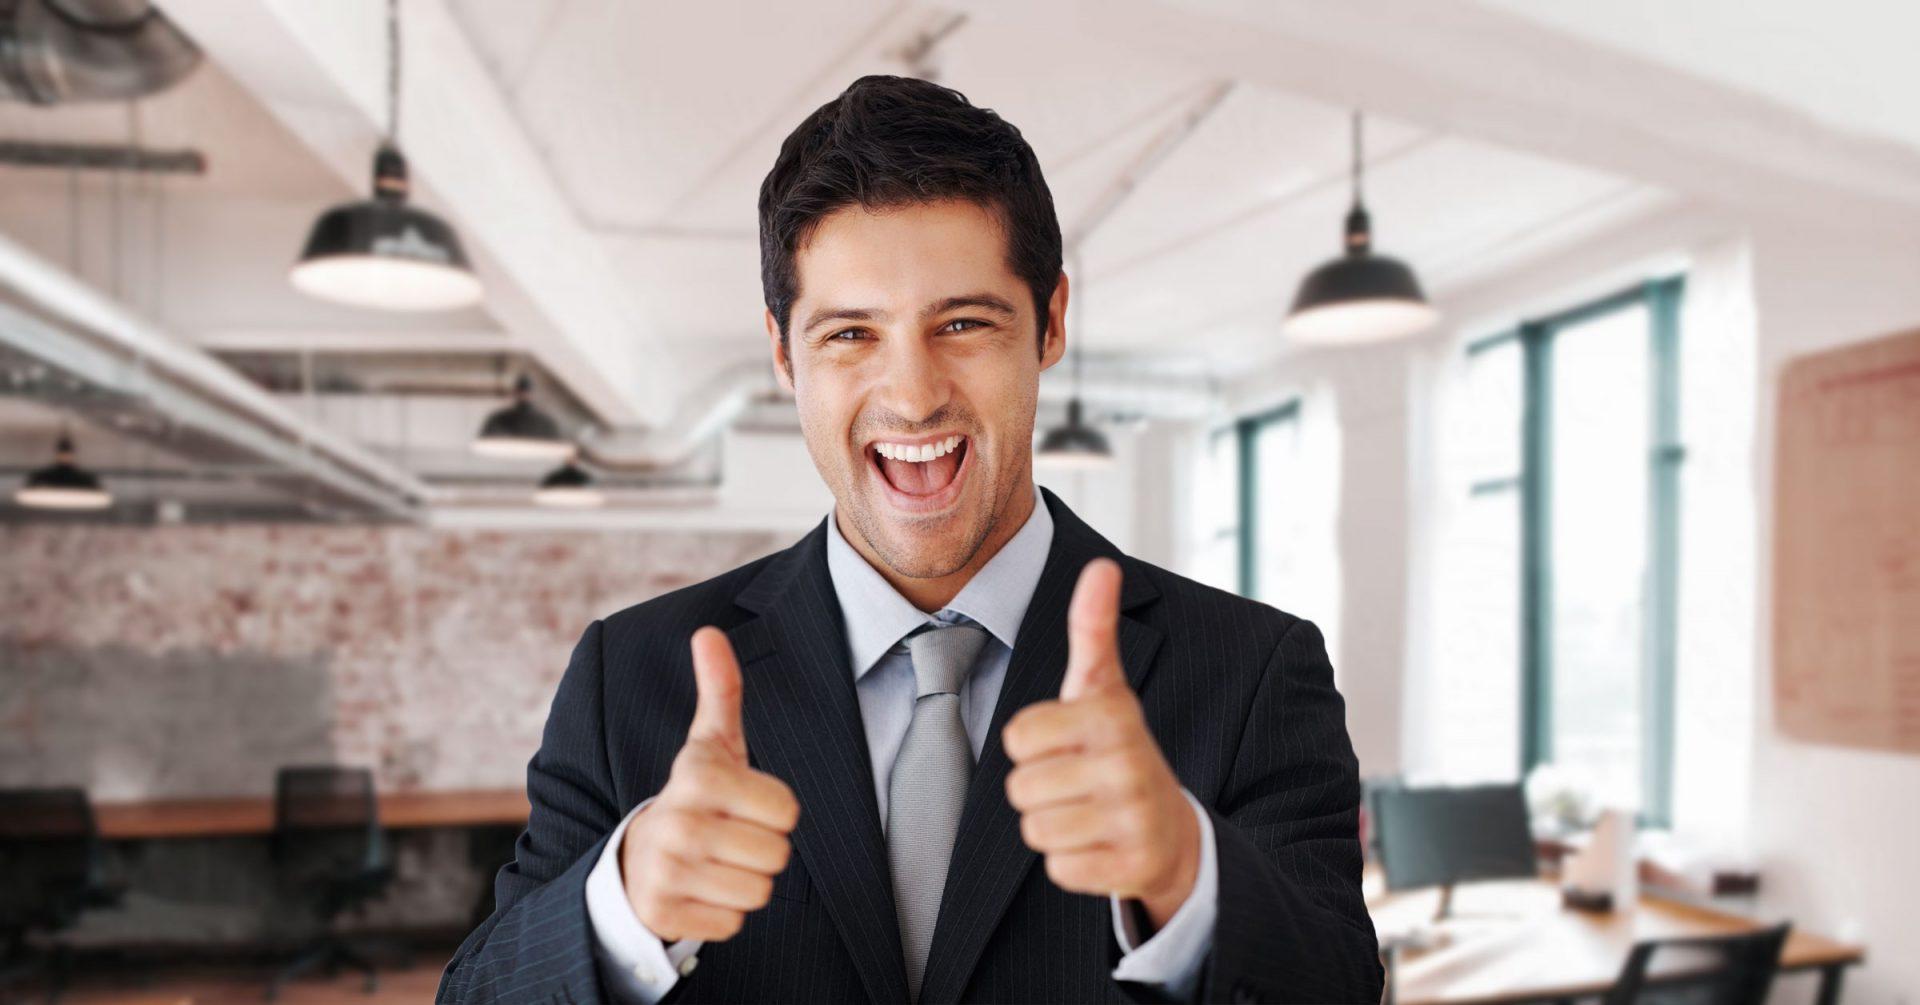 Happy Employee With Generous Benefits